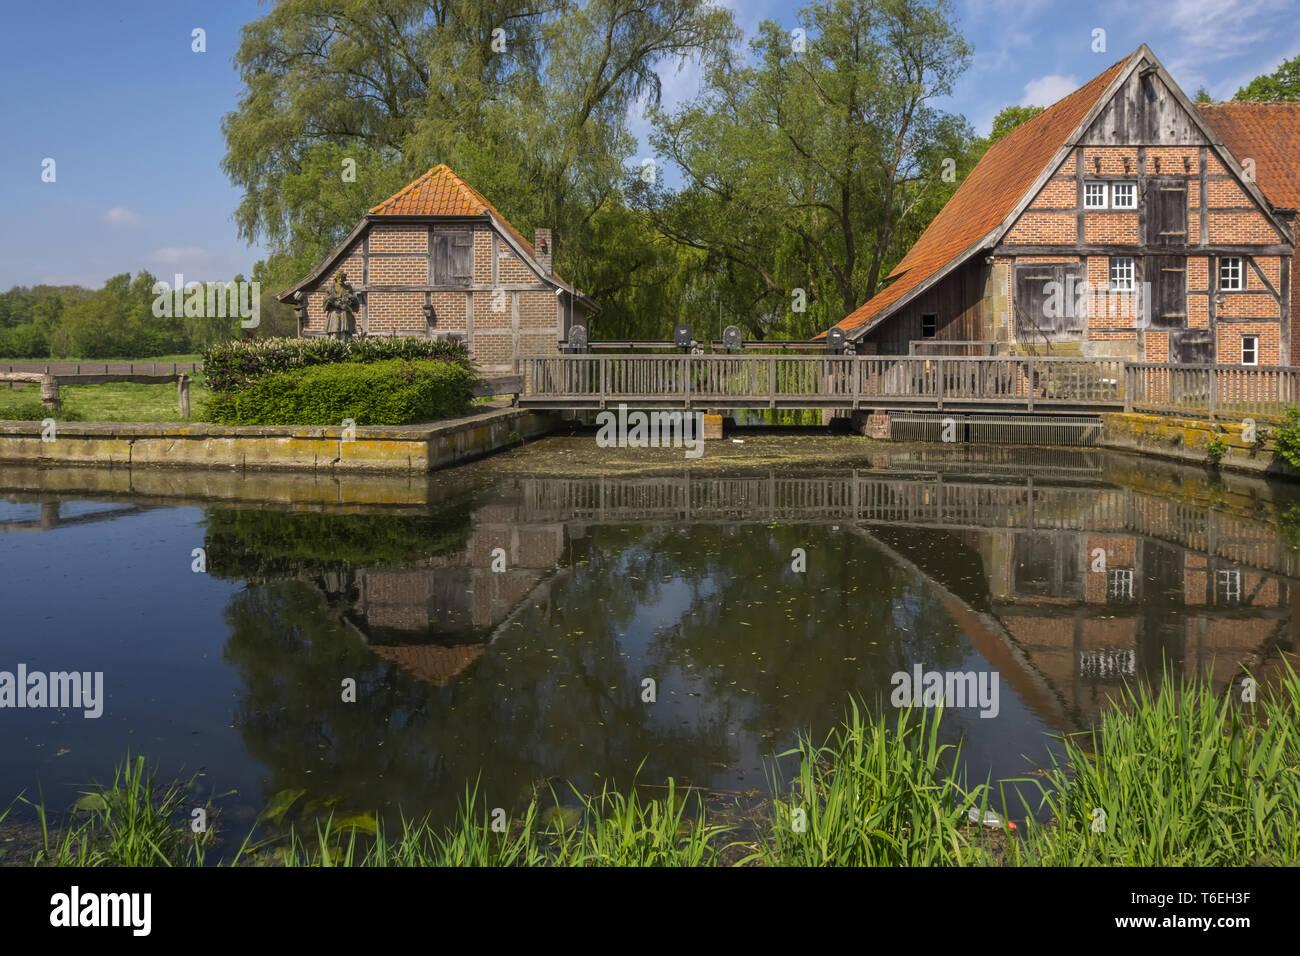 Prince Bishop grain mill to Nienborg. - Stock Image